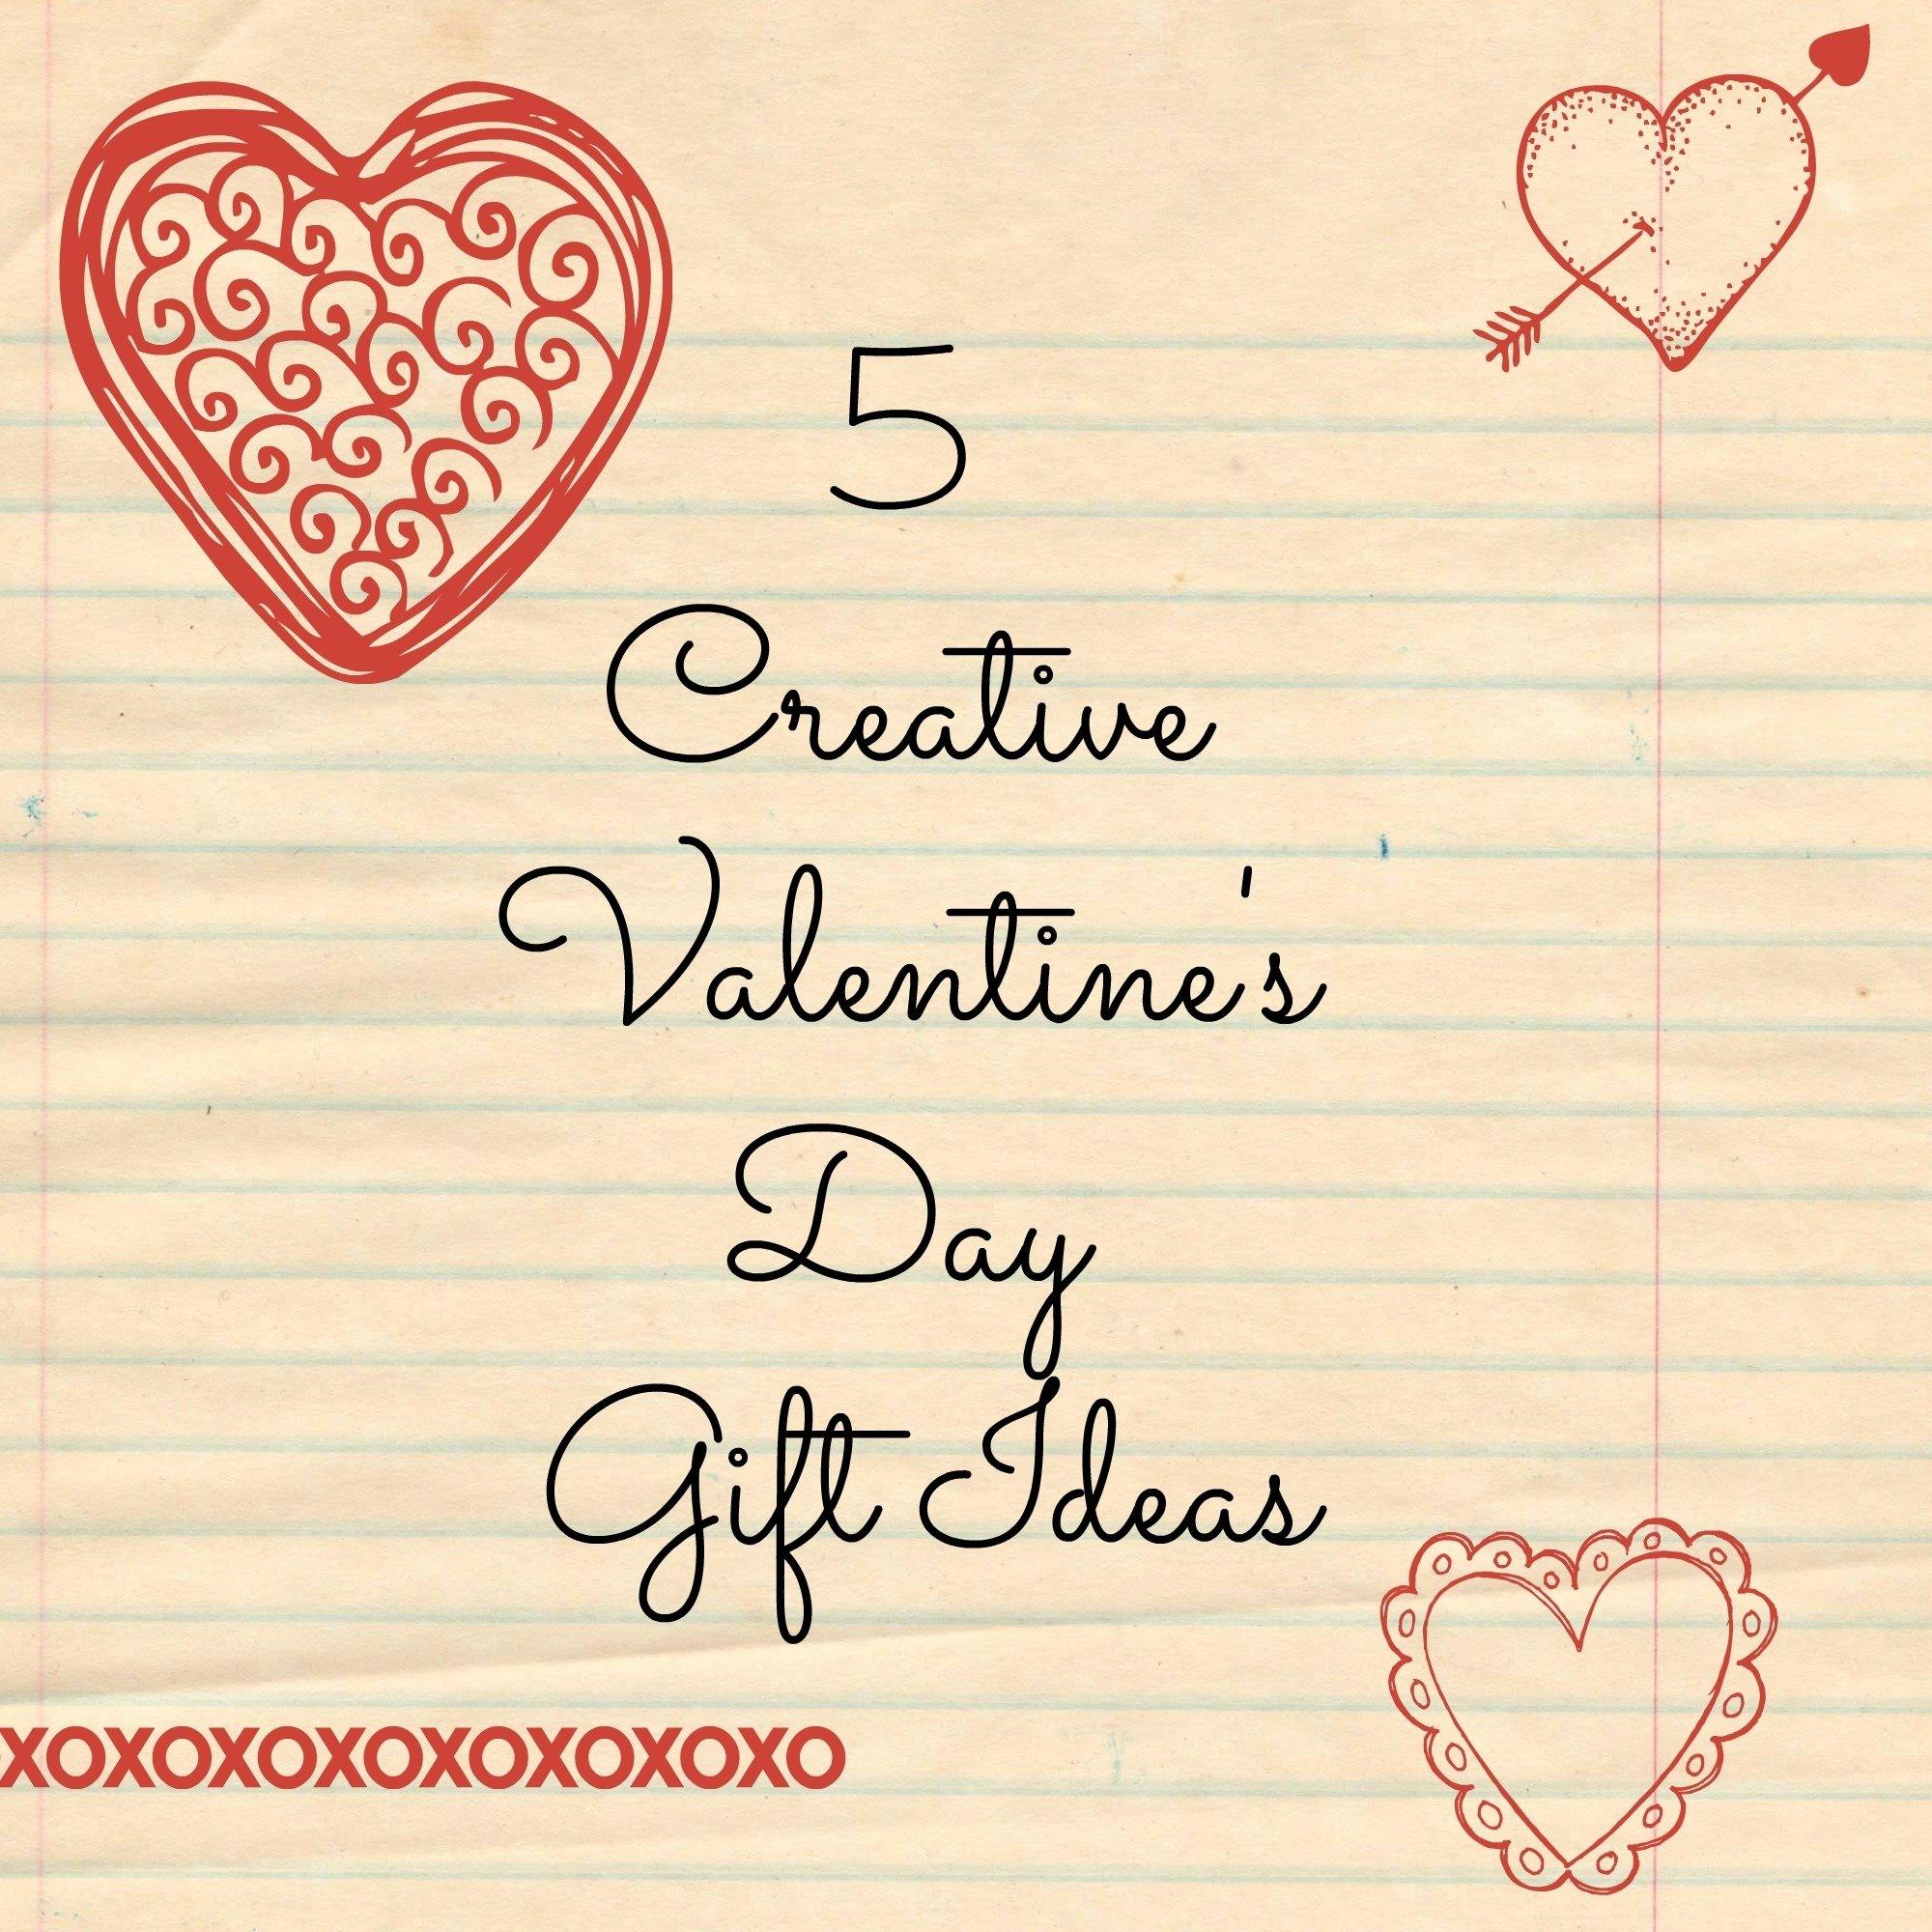 10 Unique Creative Valentine Ideas For Him